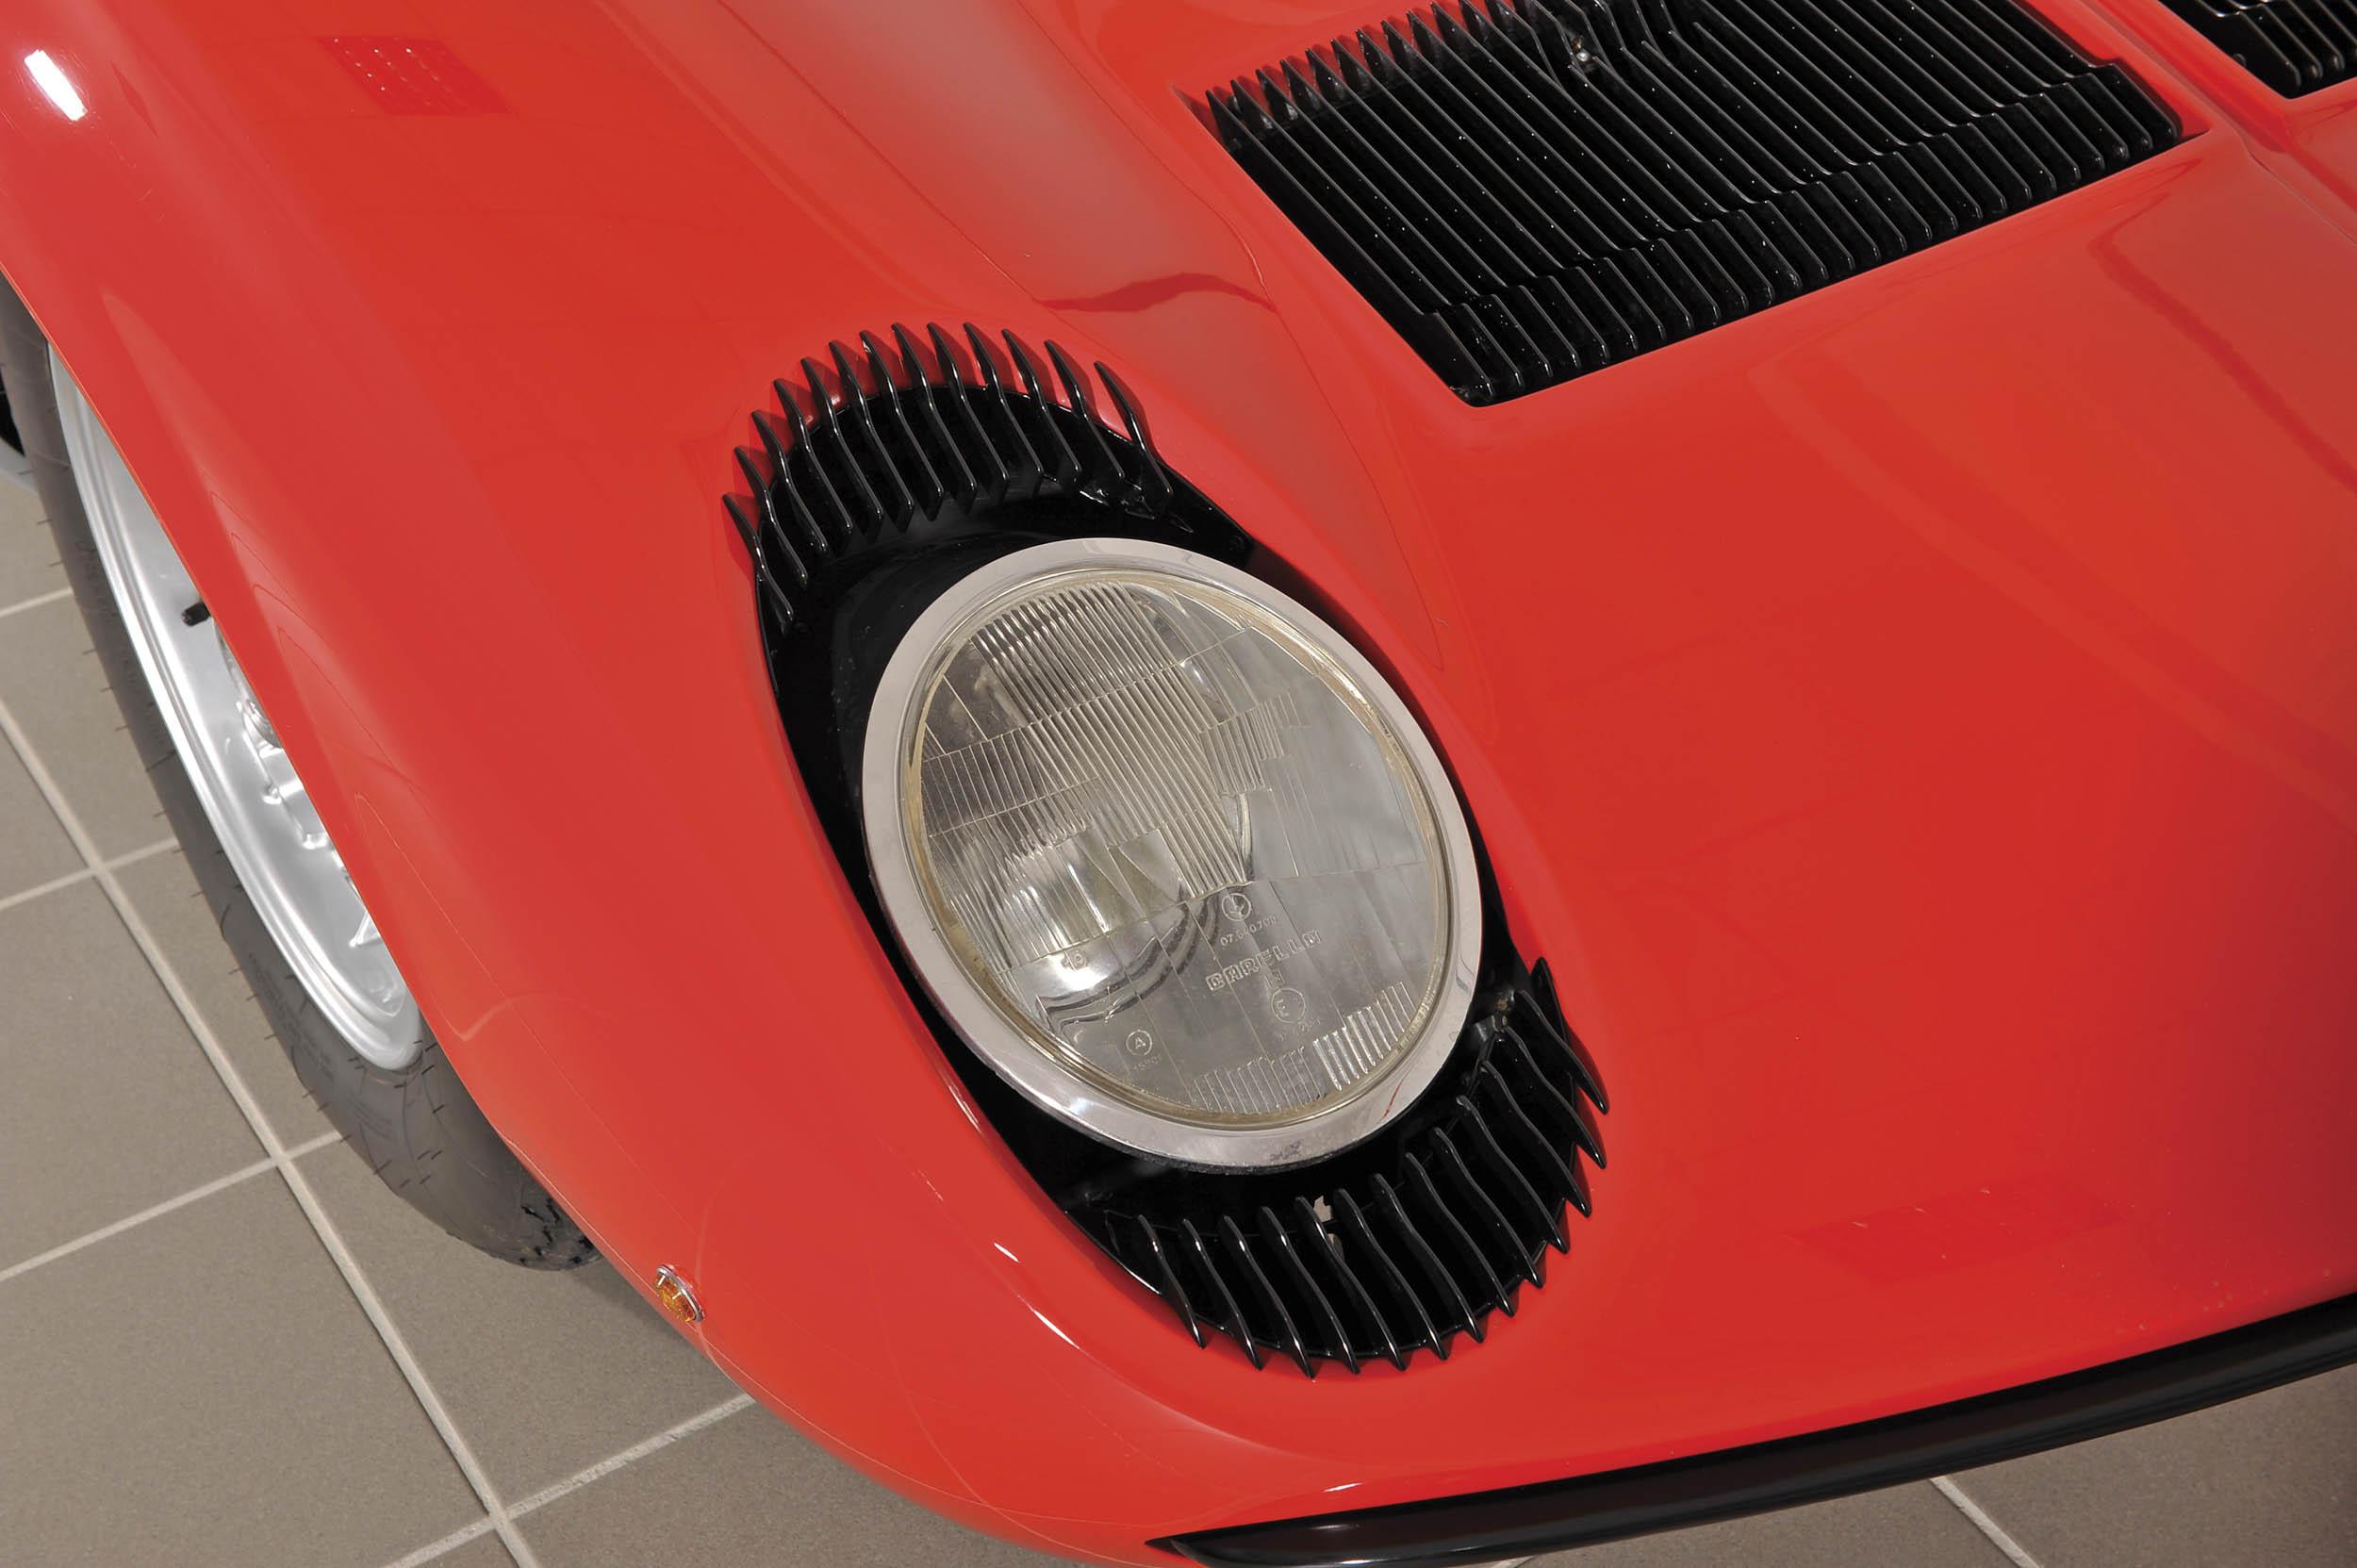 1967 Lamborghini Miura P400 headlight detail